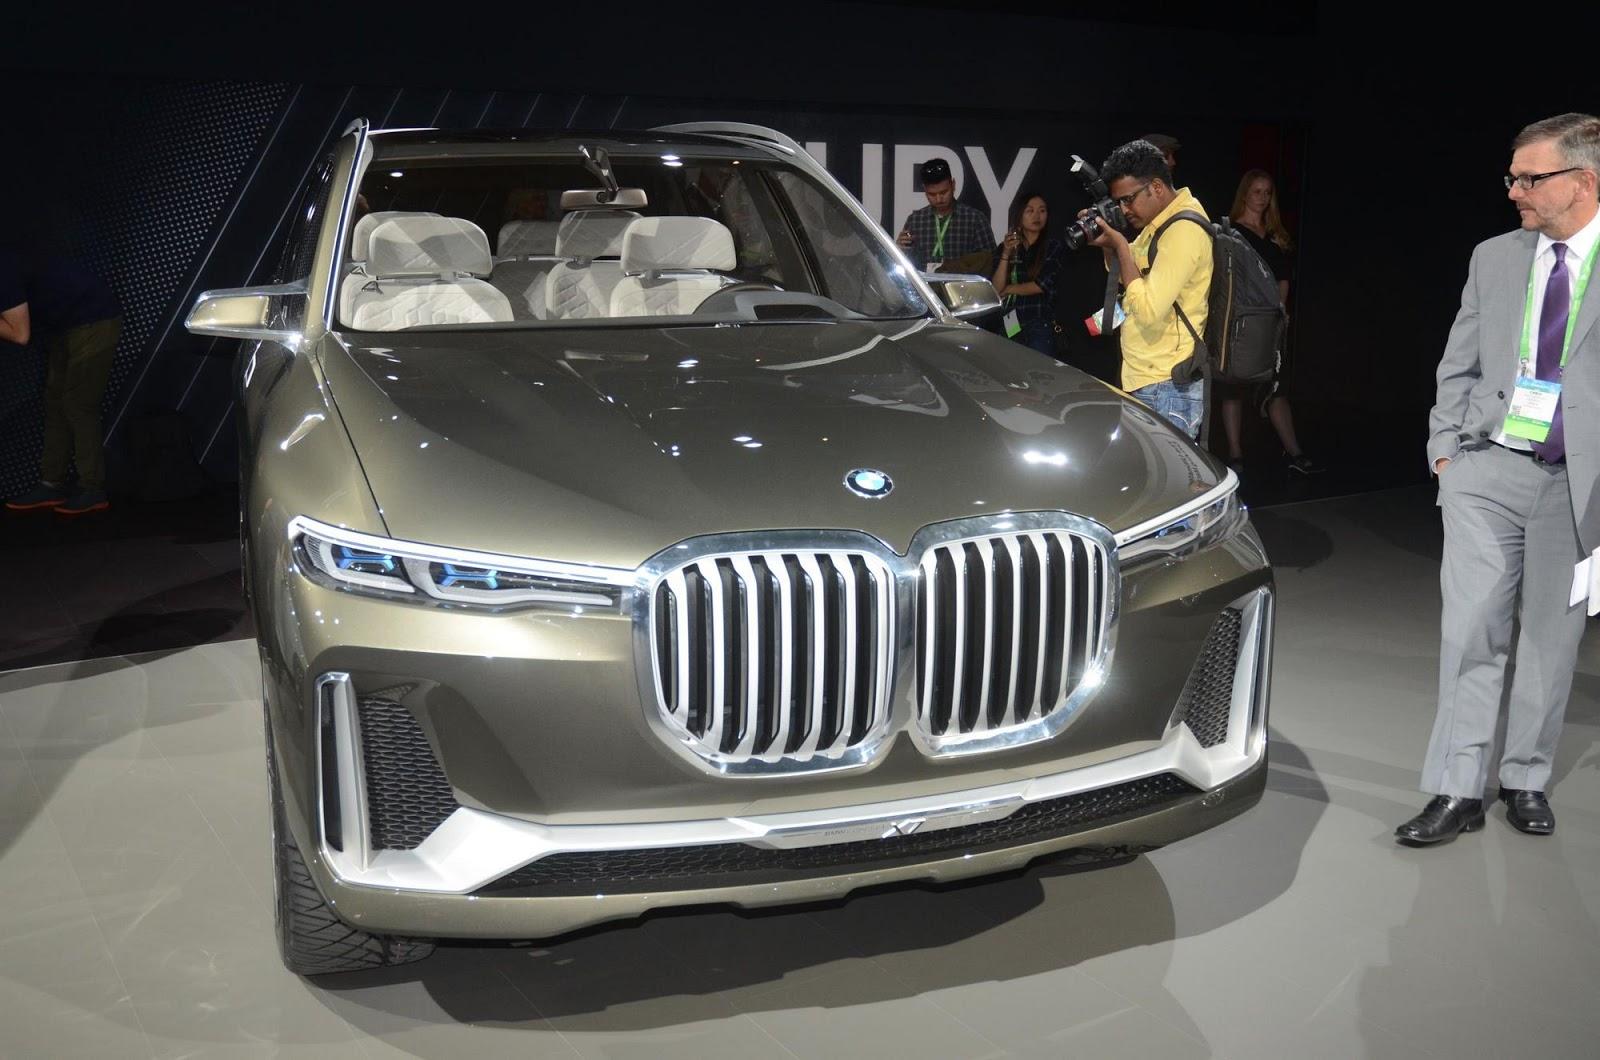 Bmw S Huge X7 Iperformance Concept Arrives In La Carscoops